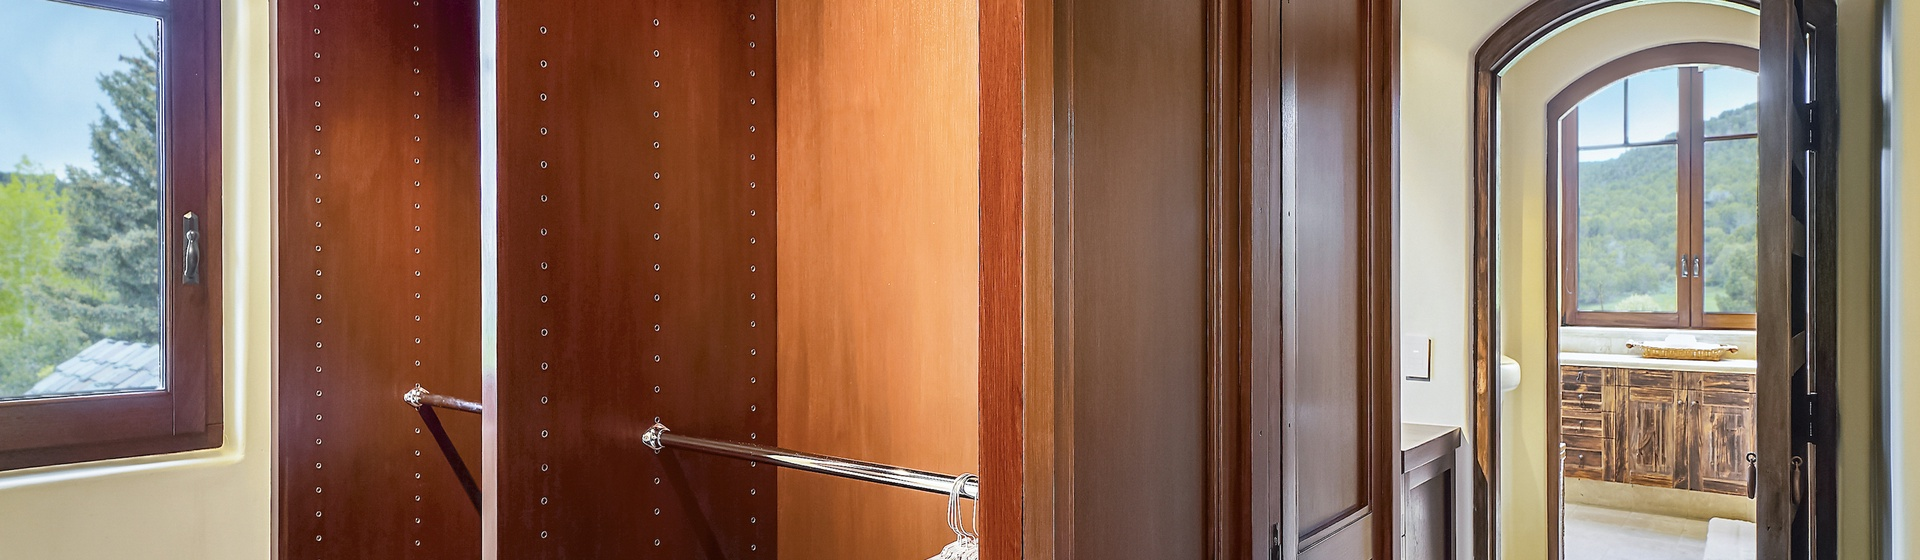 8.10-Telluride-Sleeping-Indian-Ranch-Southwest-Suite-Master-Bedroom-G-Closet-web.JPG